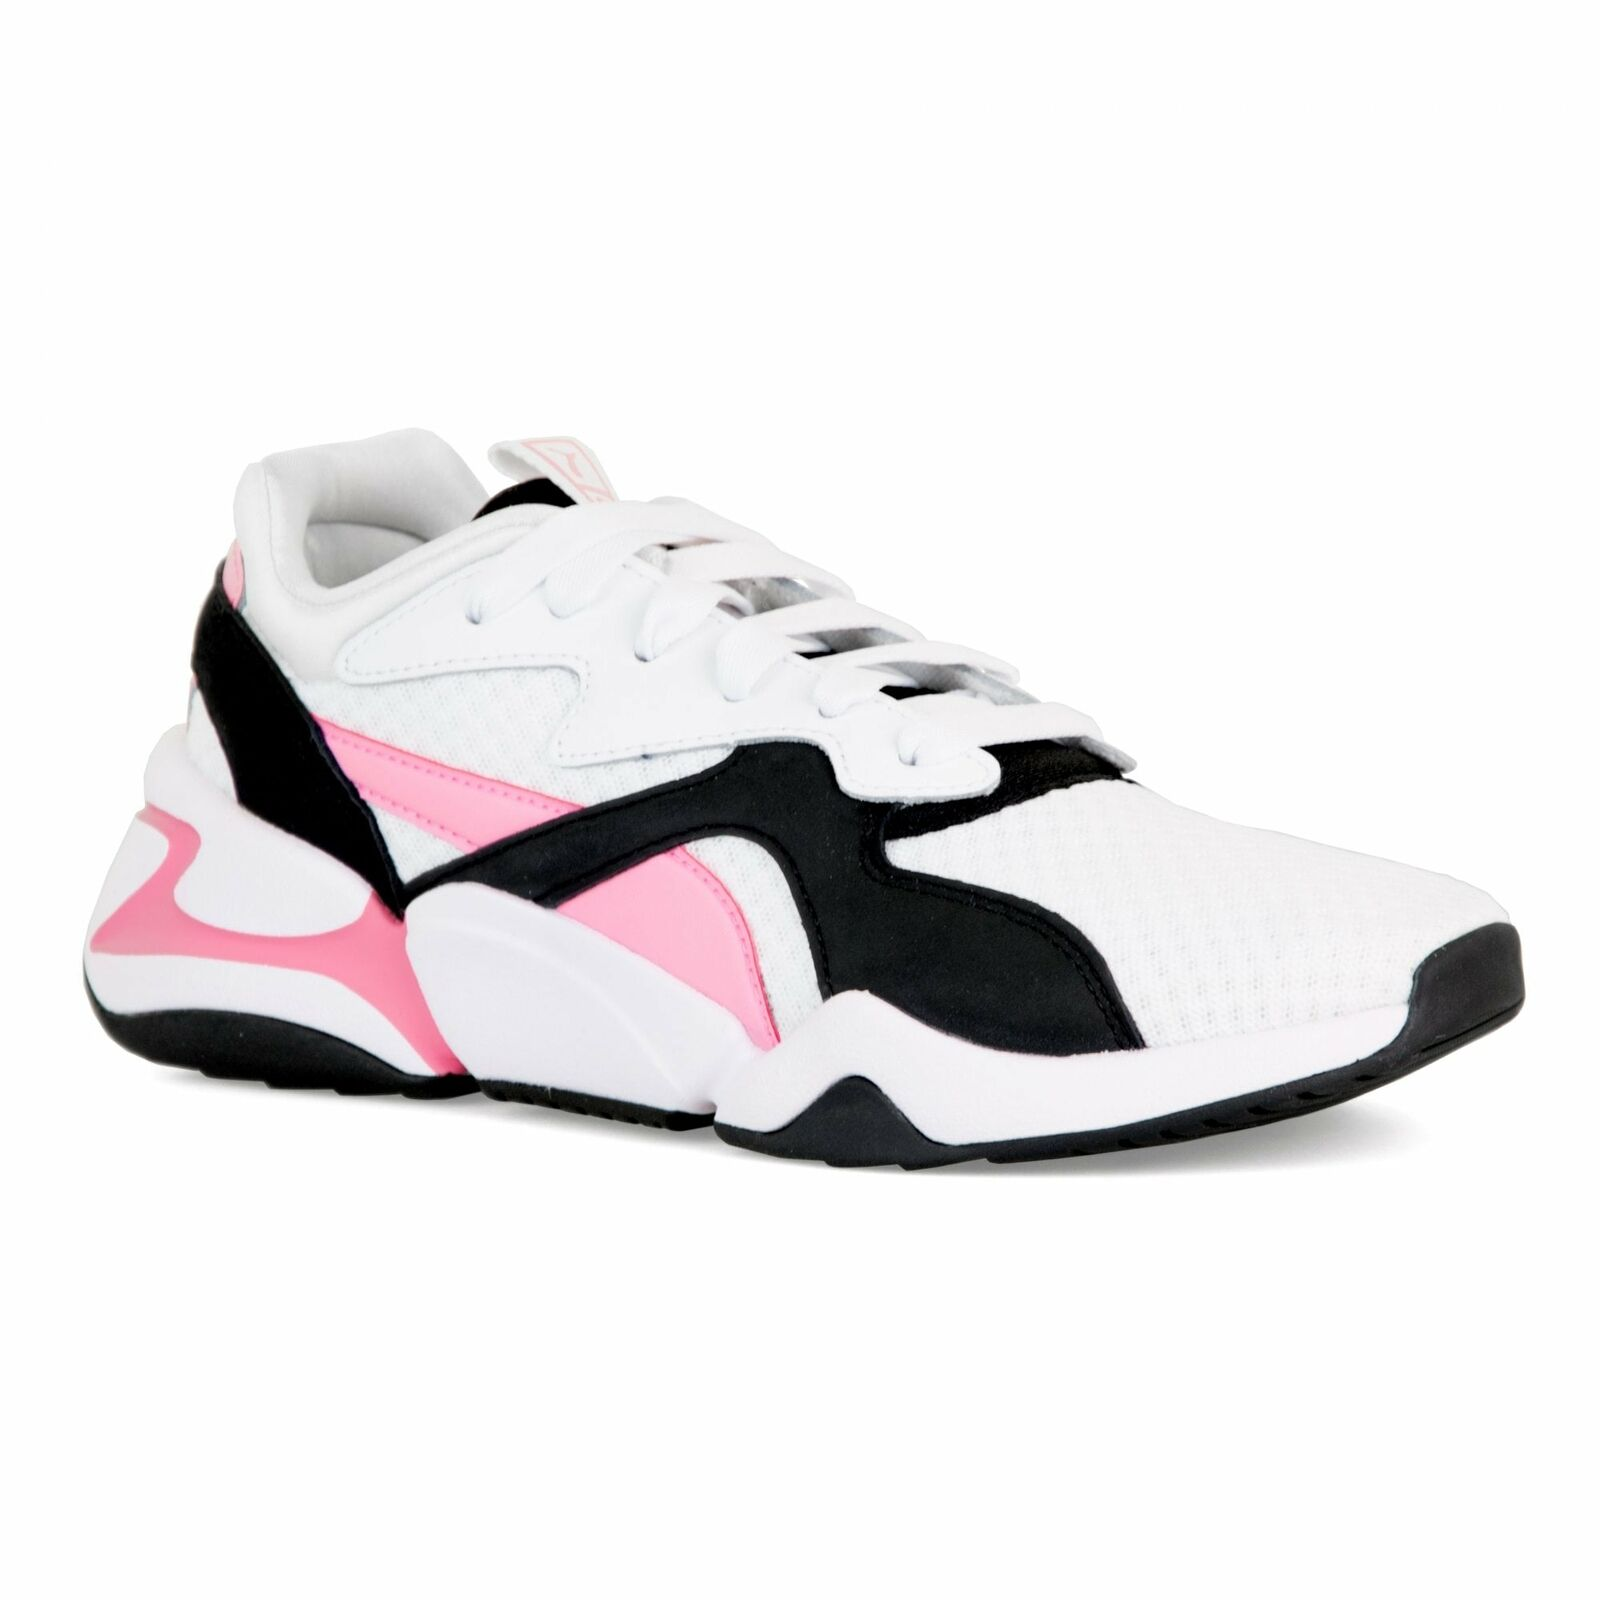 Puma Womens Nova 90's Trainers (White)